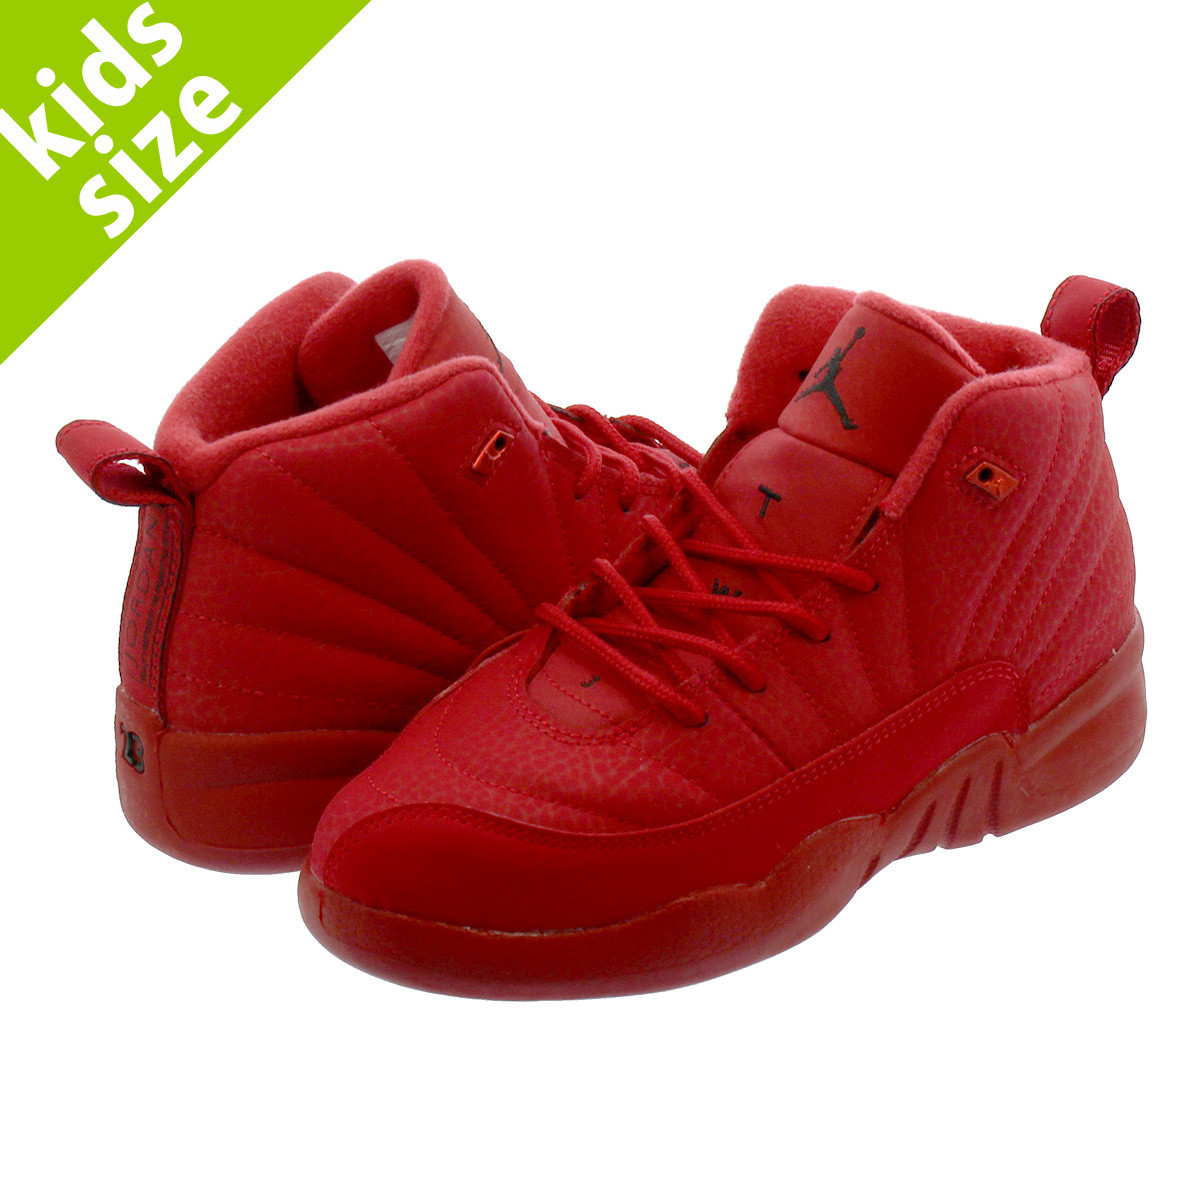 new arrival 4c33d da1cb NIKE AIR JORDAN 12 RETRO PS Nike Air Jordan 12 nostalgic PS GYM  RED/BLACK/BLACK 151,186-601